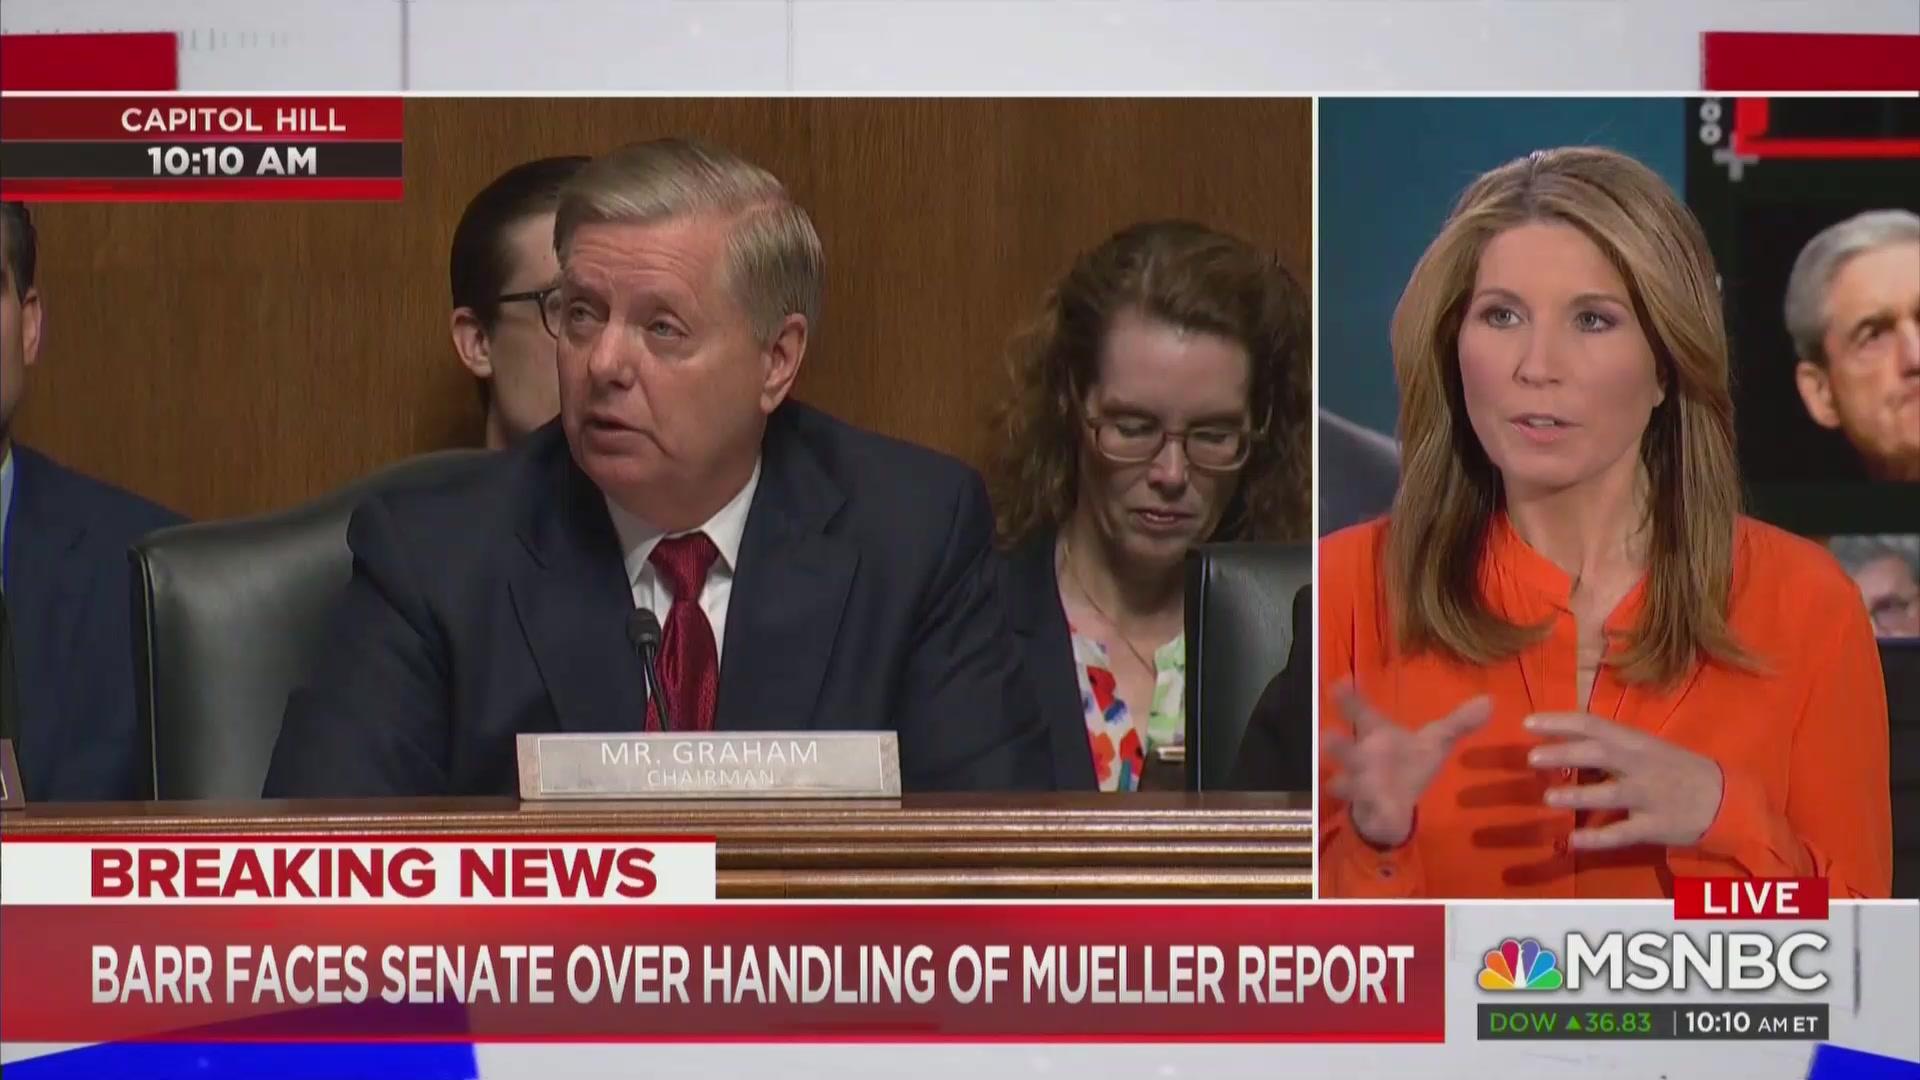 MSNBC Cuts Into Barr Hearing to Call AG a Liar, Lindsey Graham Trump's 'Human Shield'